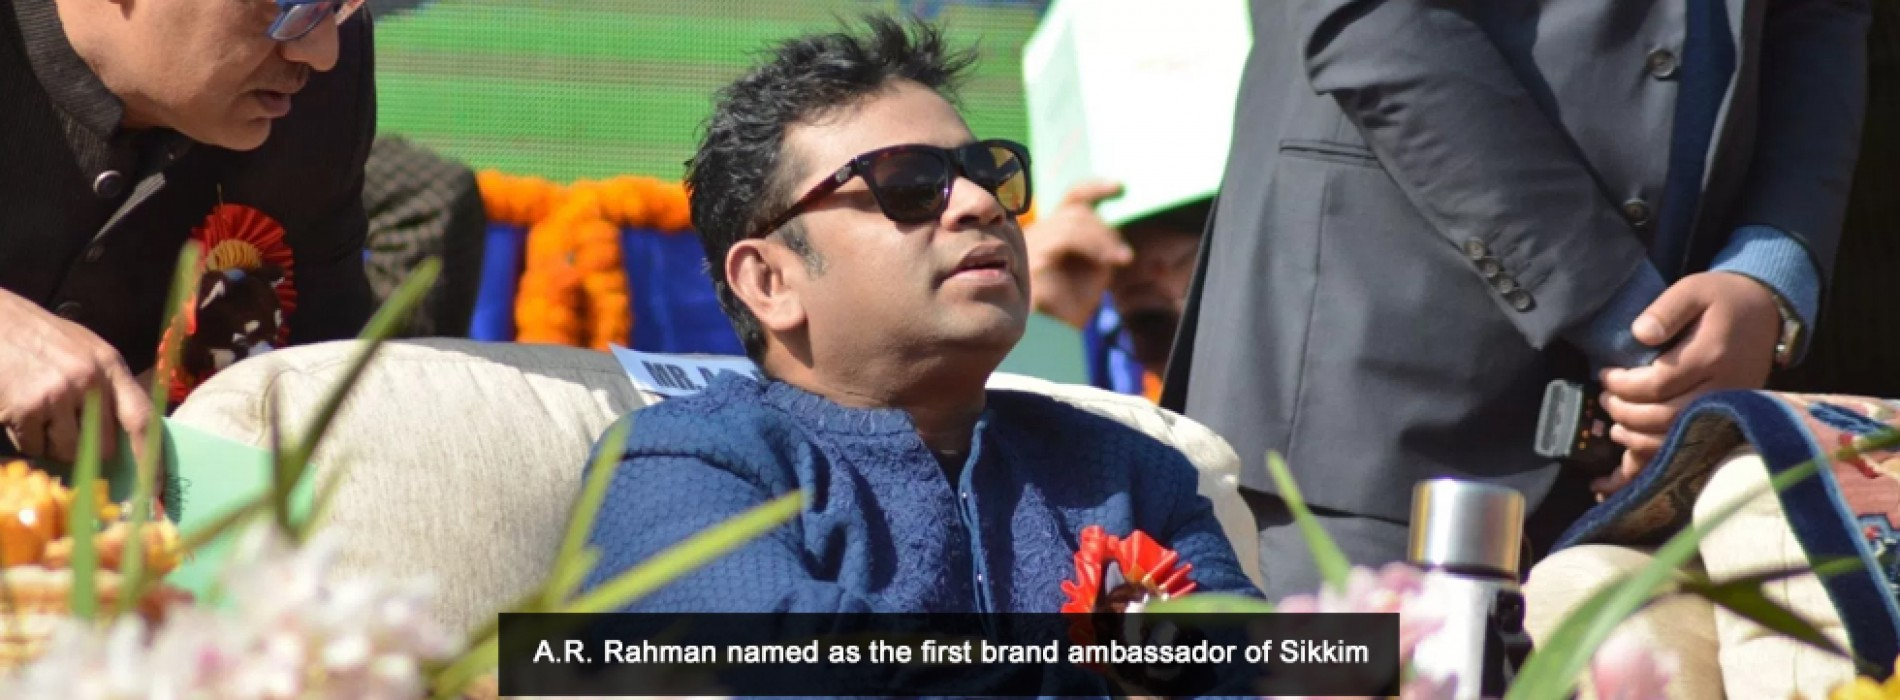 A R Rahman named as the brand ambassador of Sikkim